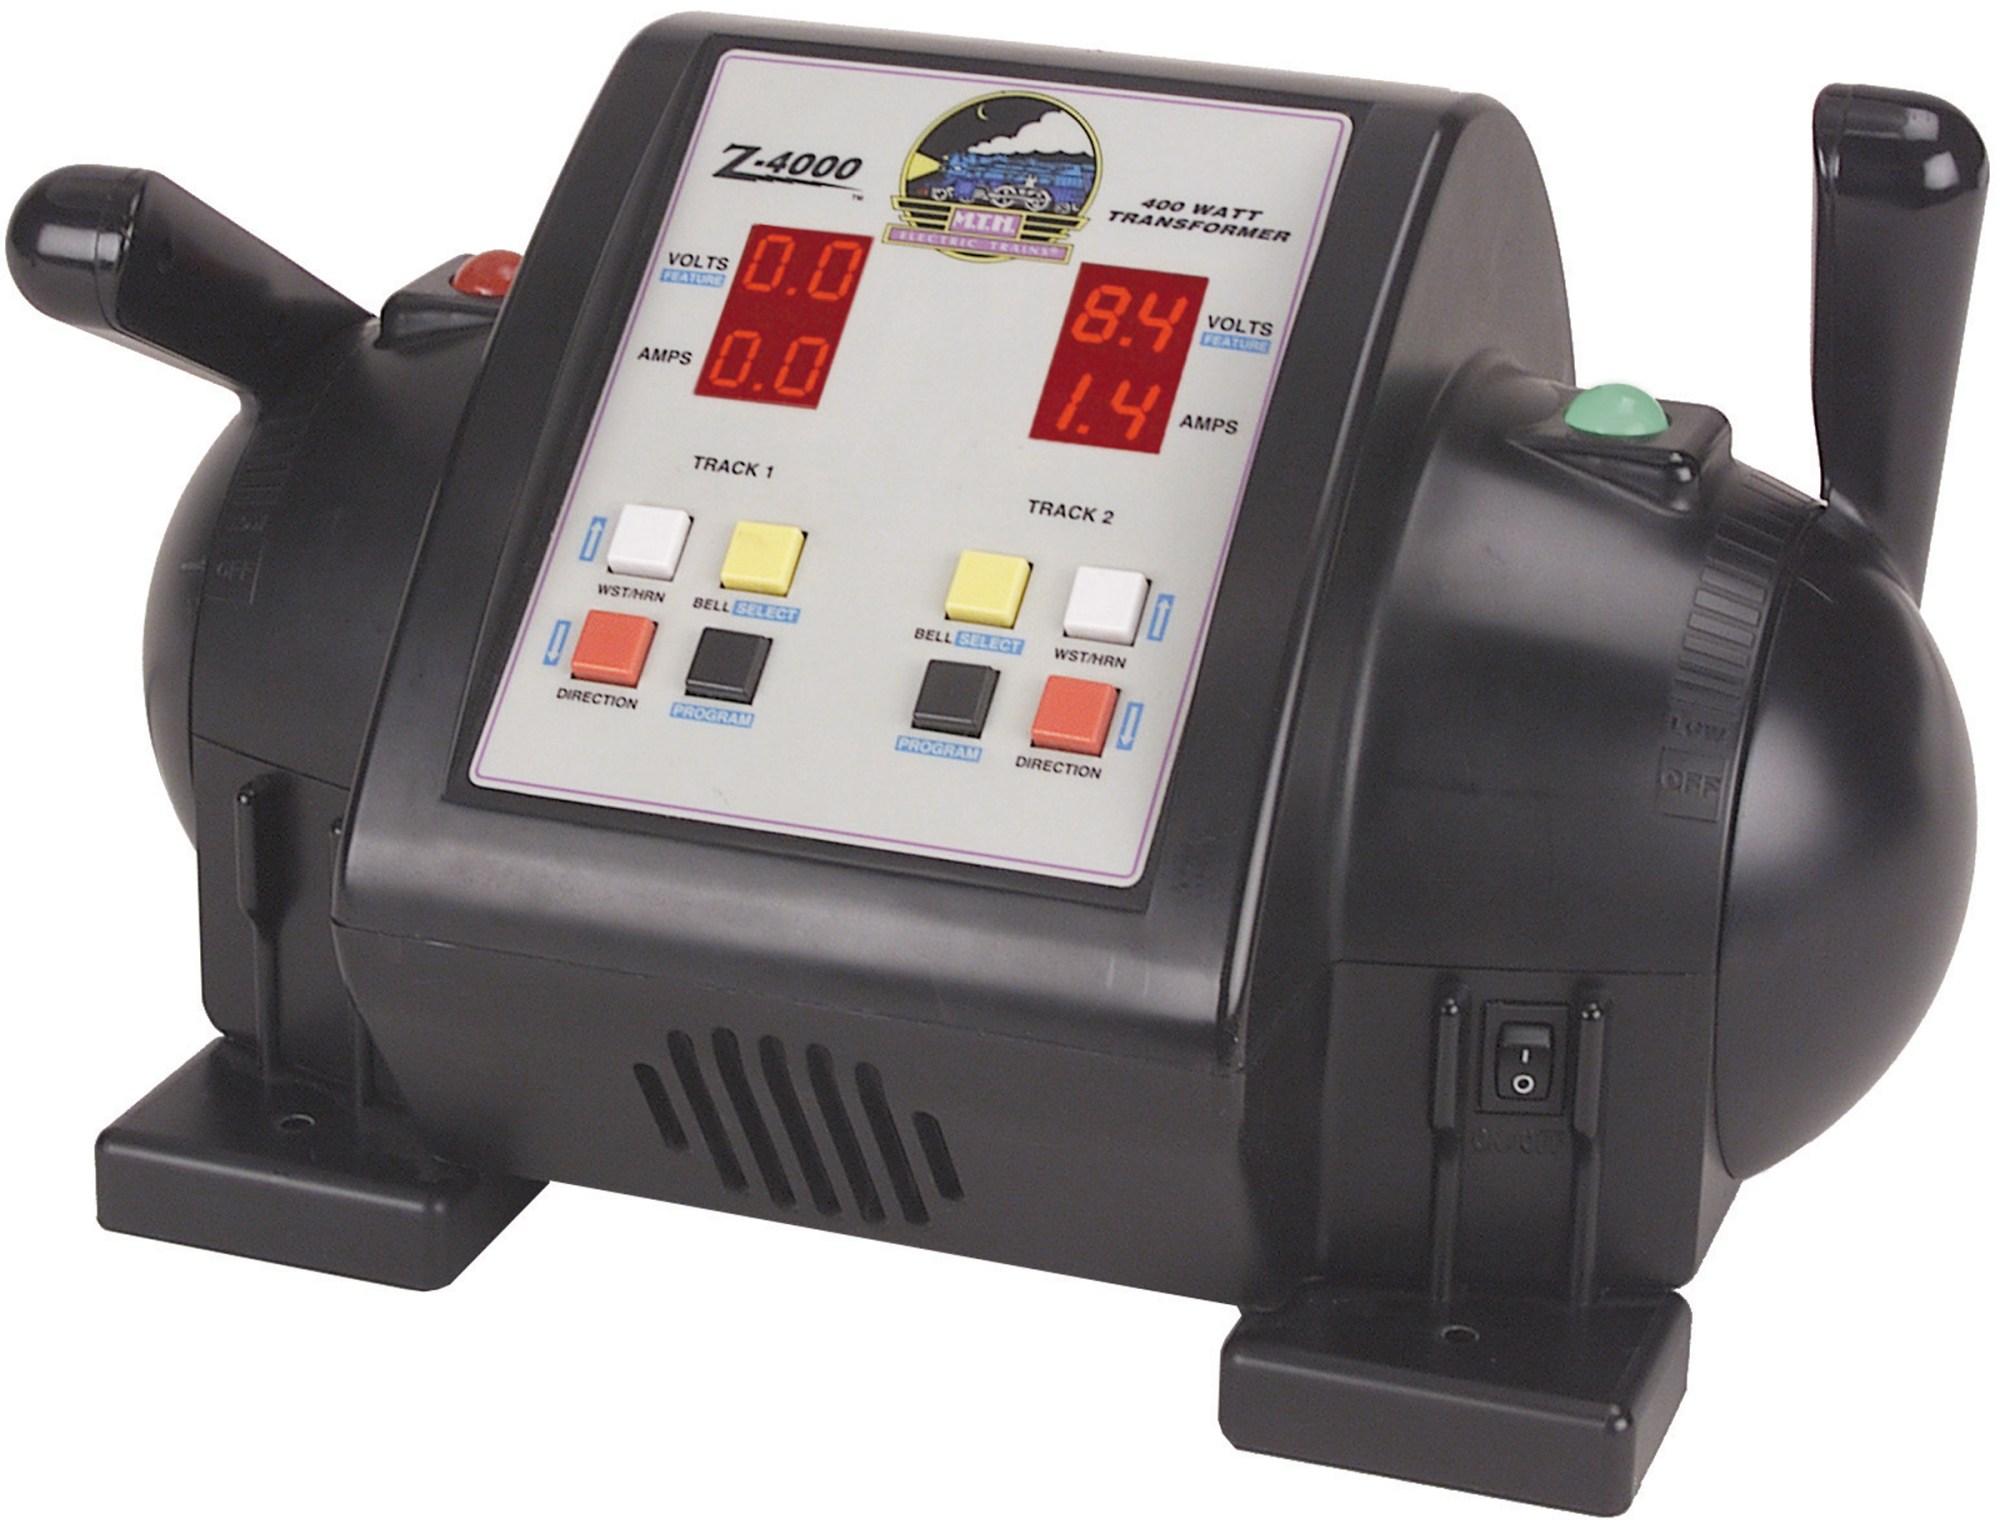 hight resolution of z 4000 transformer